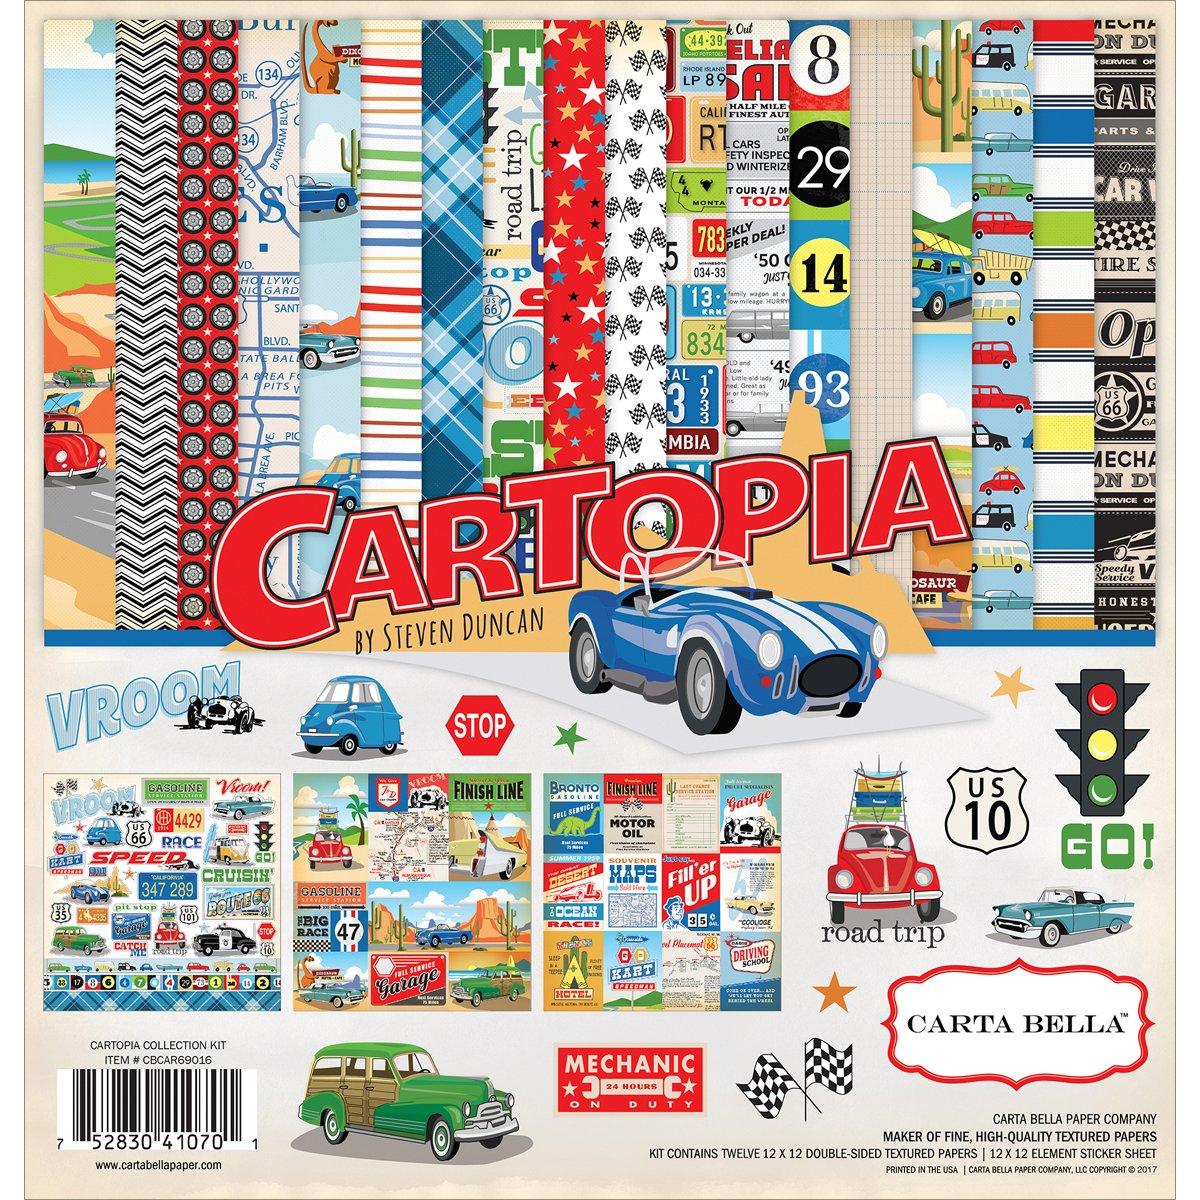 Carta Bella CBCAR69016 12 x 12 Car Collection Kit